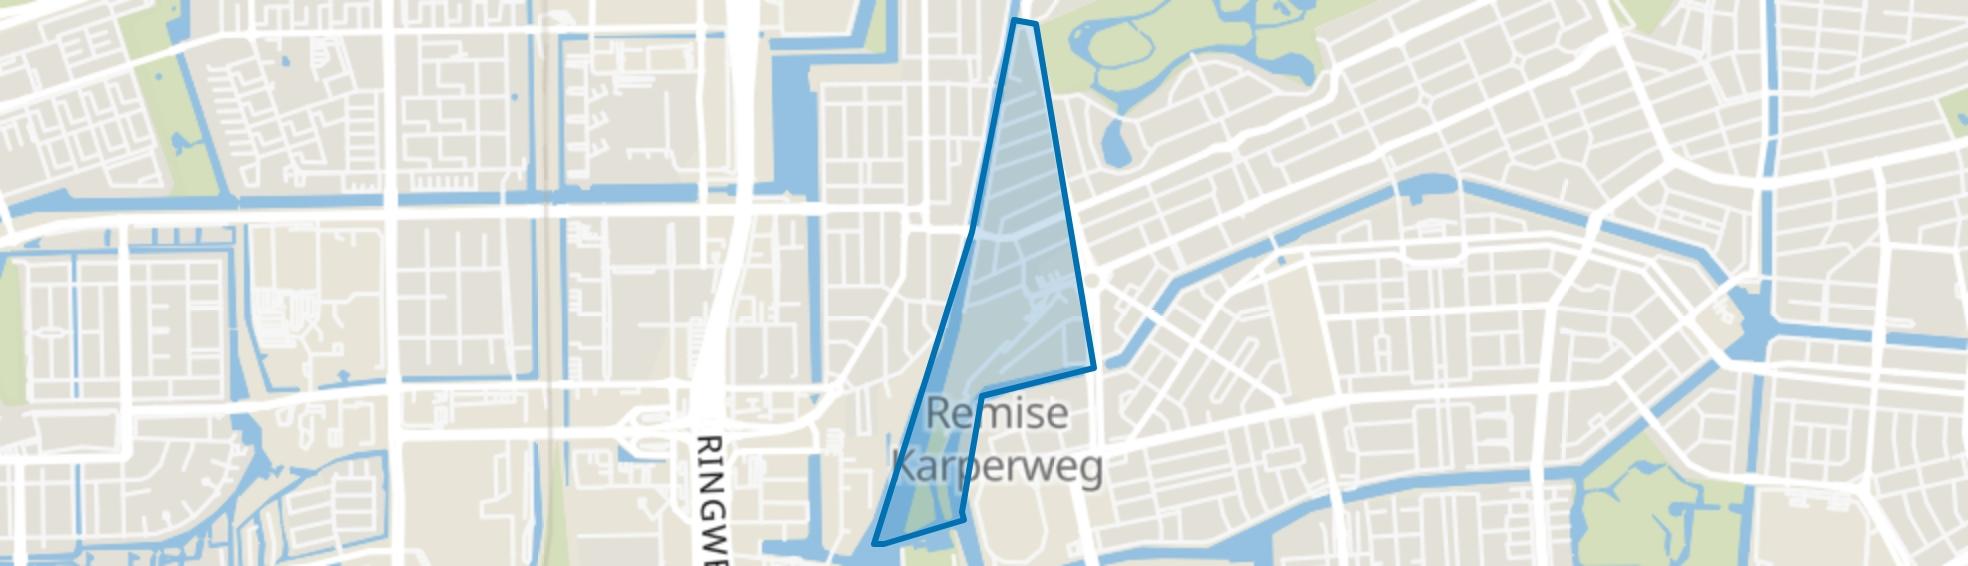 Schinkelbuurt, Amsterdam map